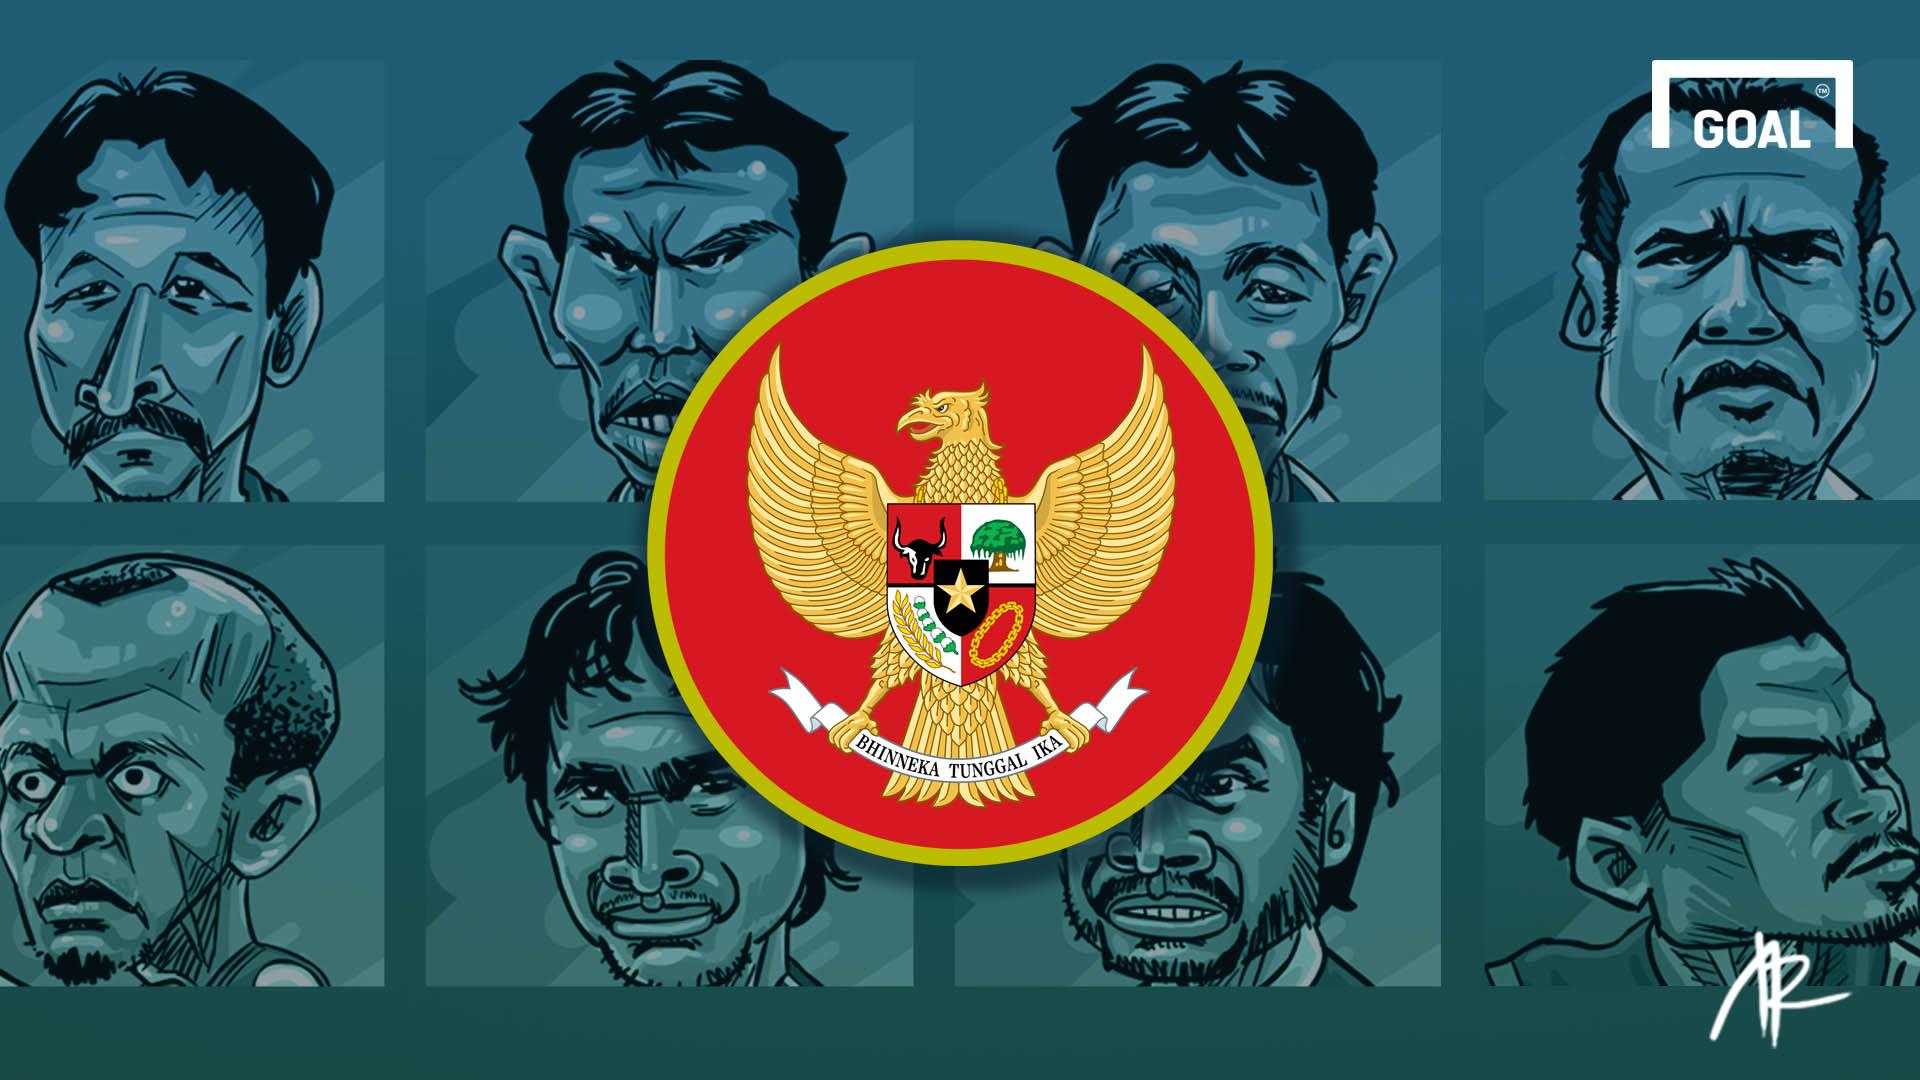 Galeri Kartun Parade Jersey Timnas Indonesia Dari Piala AFF Ke